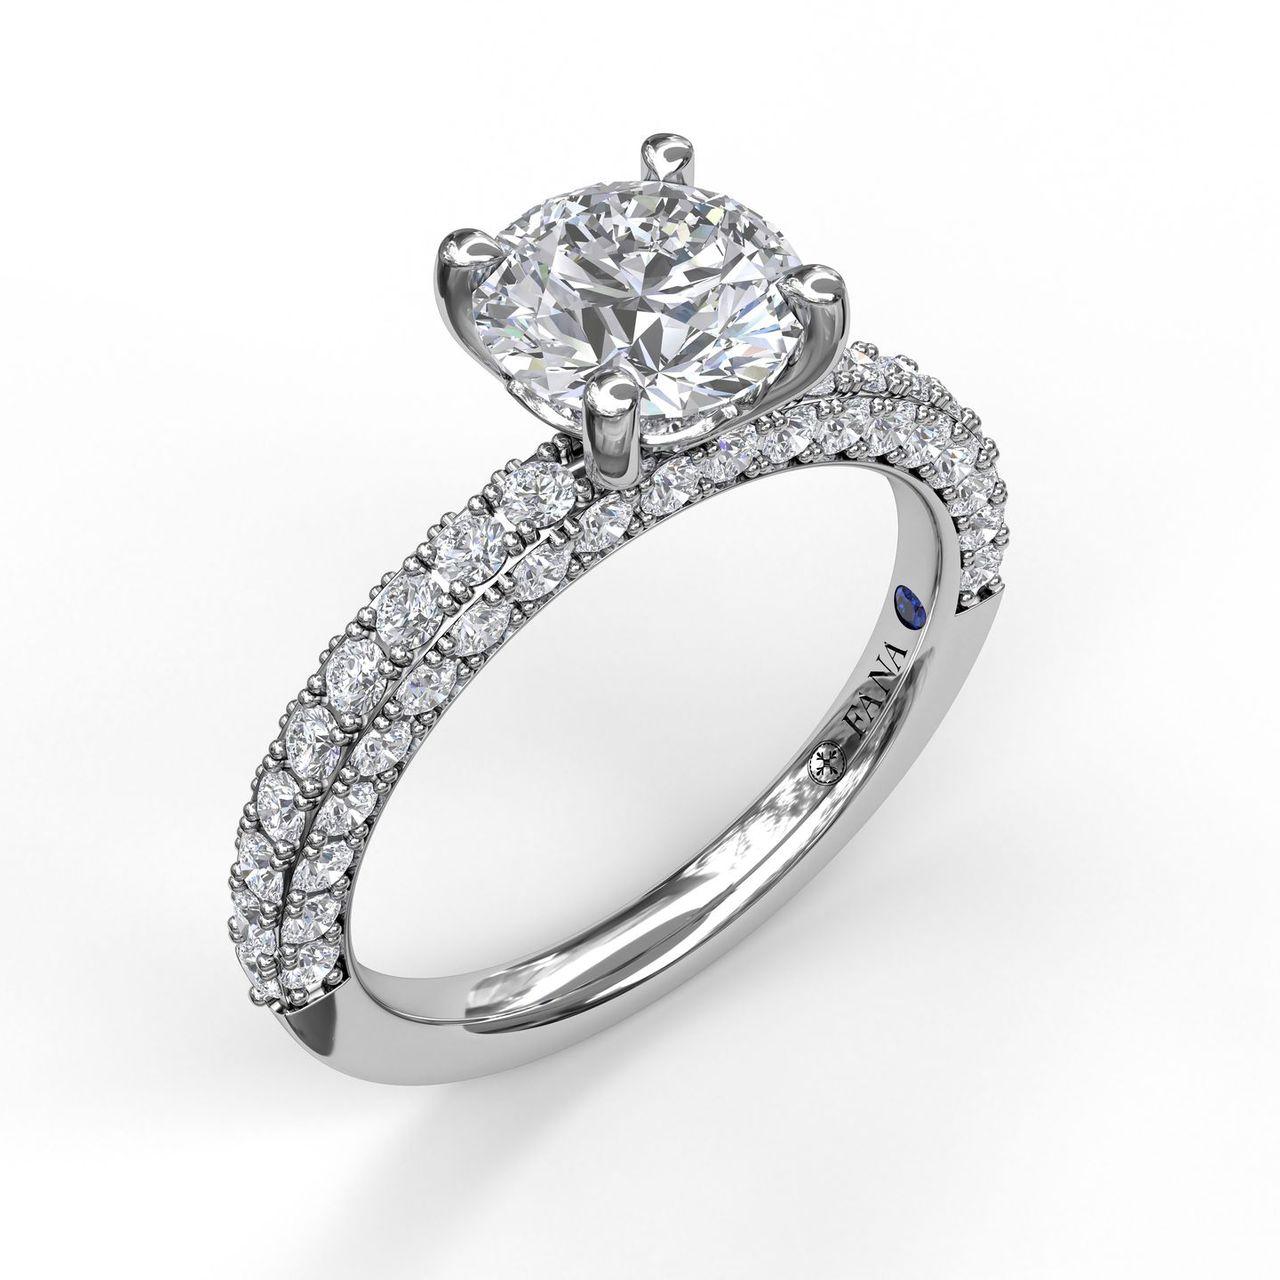 Diamond-Encrusted Engagement Ring